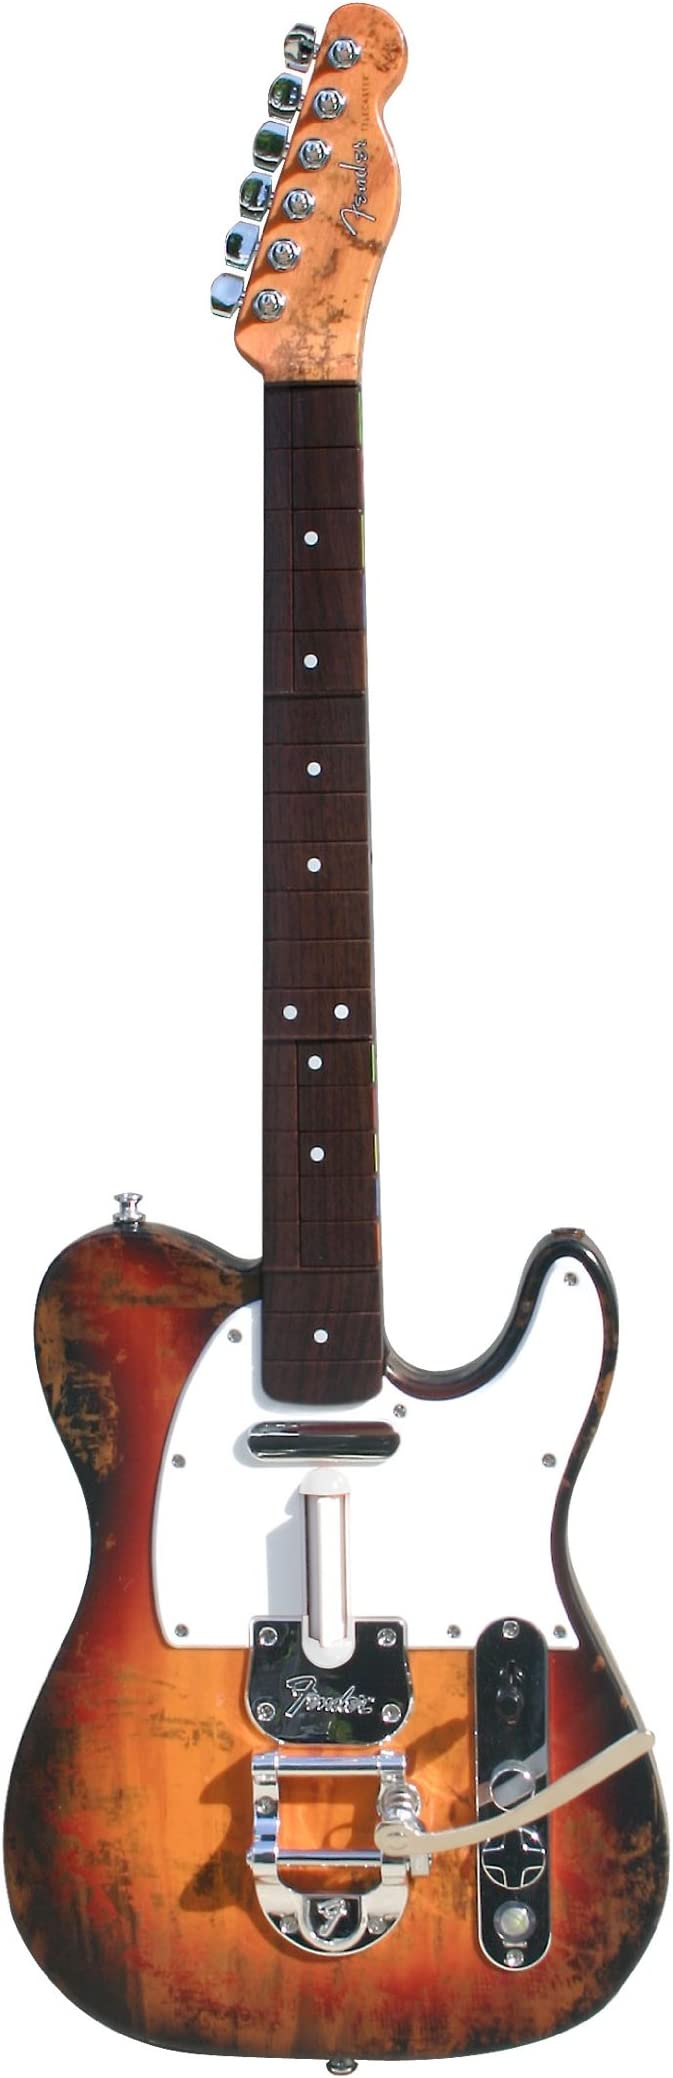 Rock Band Guitar Wiring Diagram Simple Electrical 71 Tele Amazon Com Xbox 360 Wireless Fender Telecaster Players Jackson Diagrams